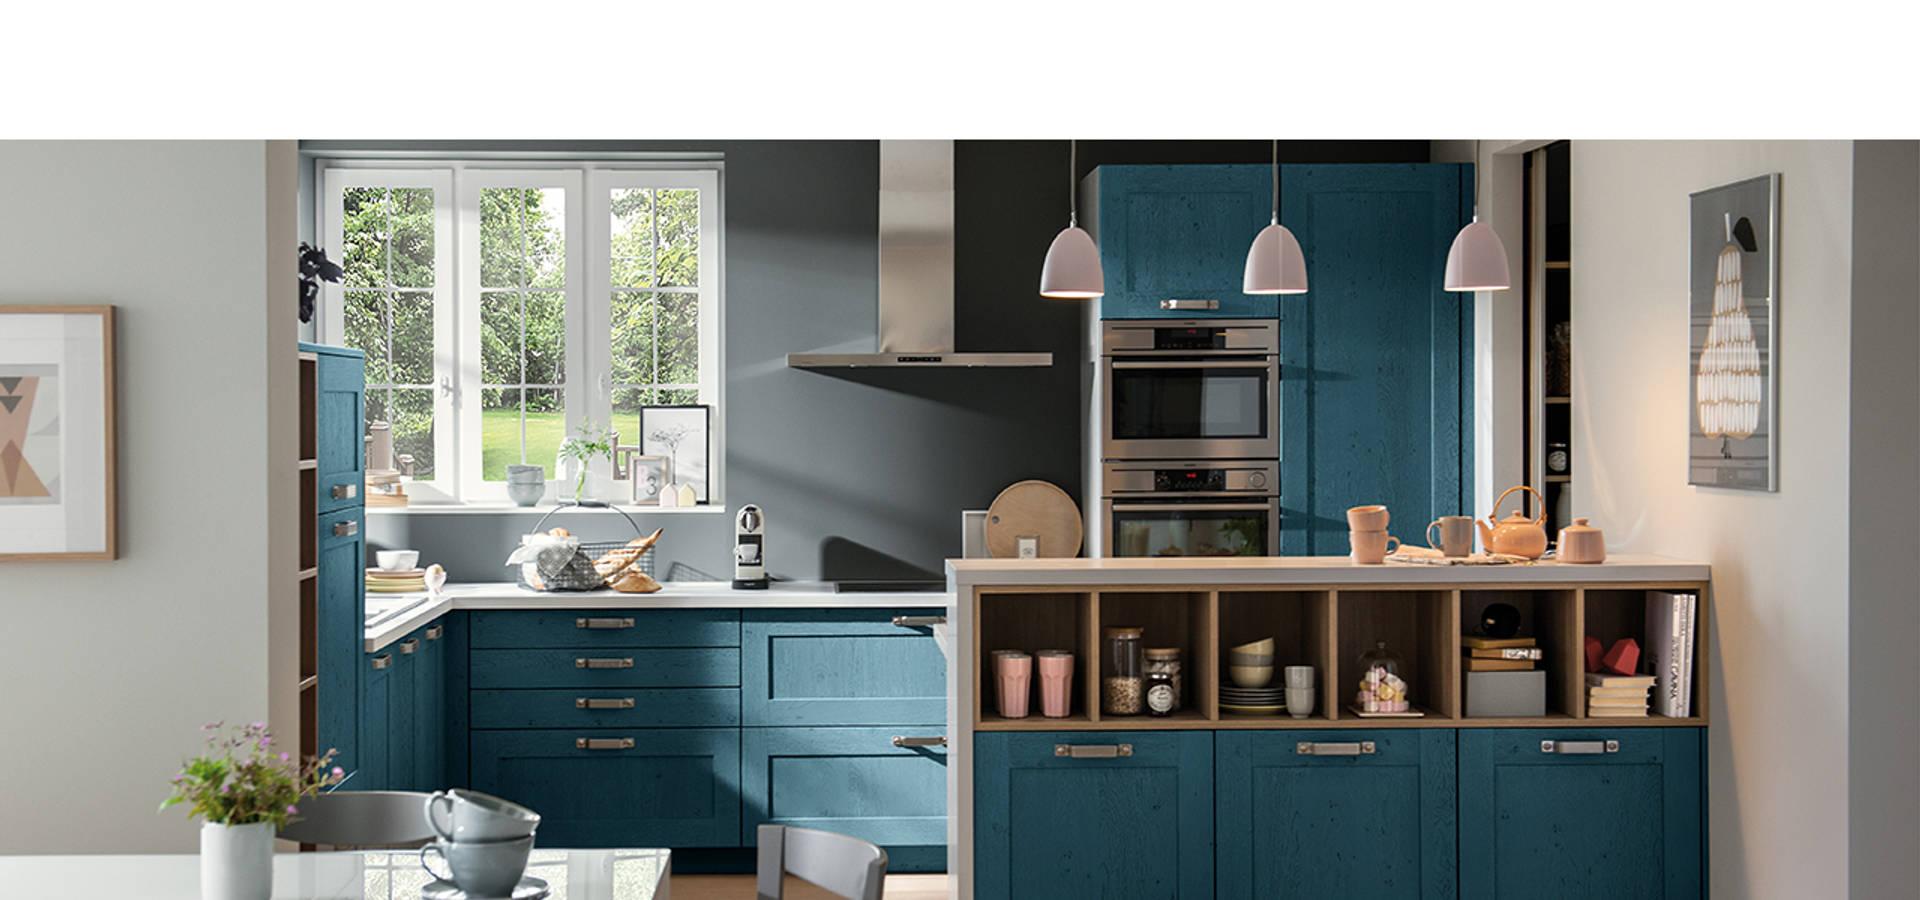 Schmidt Kitchens Barnet